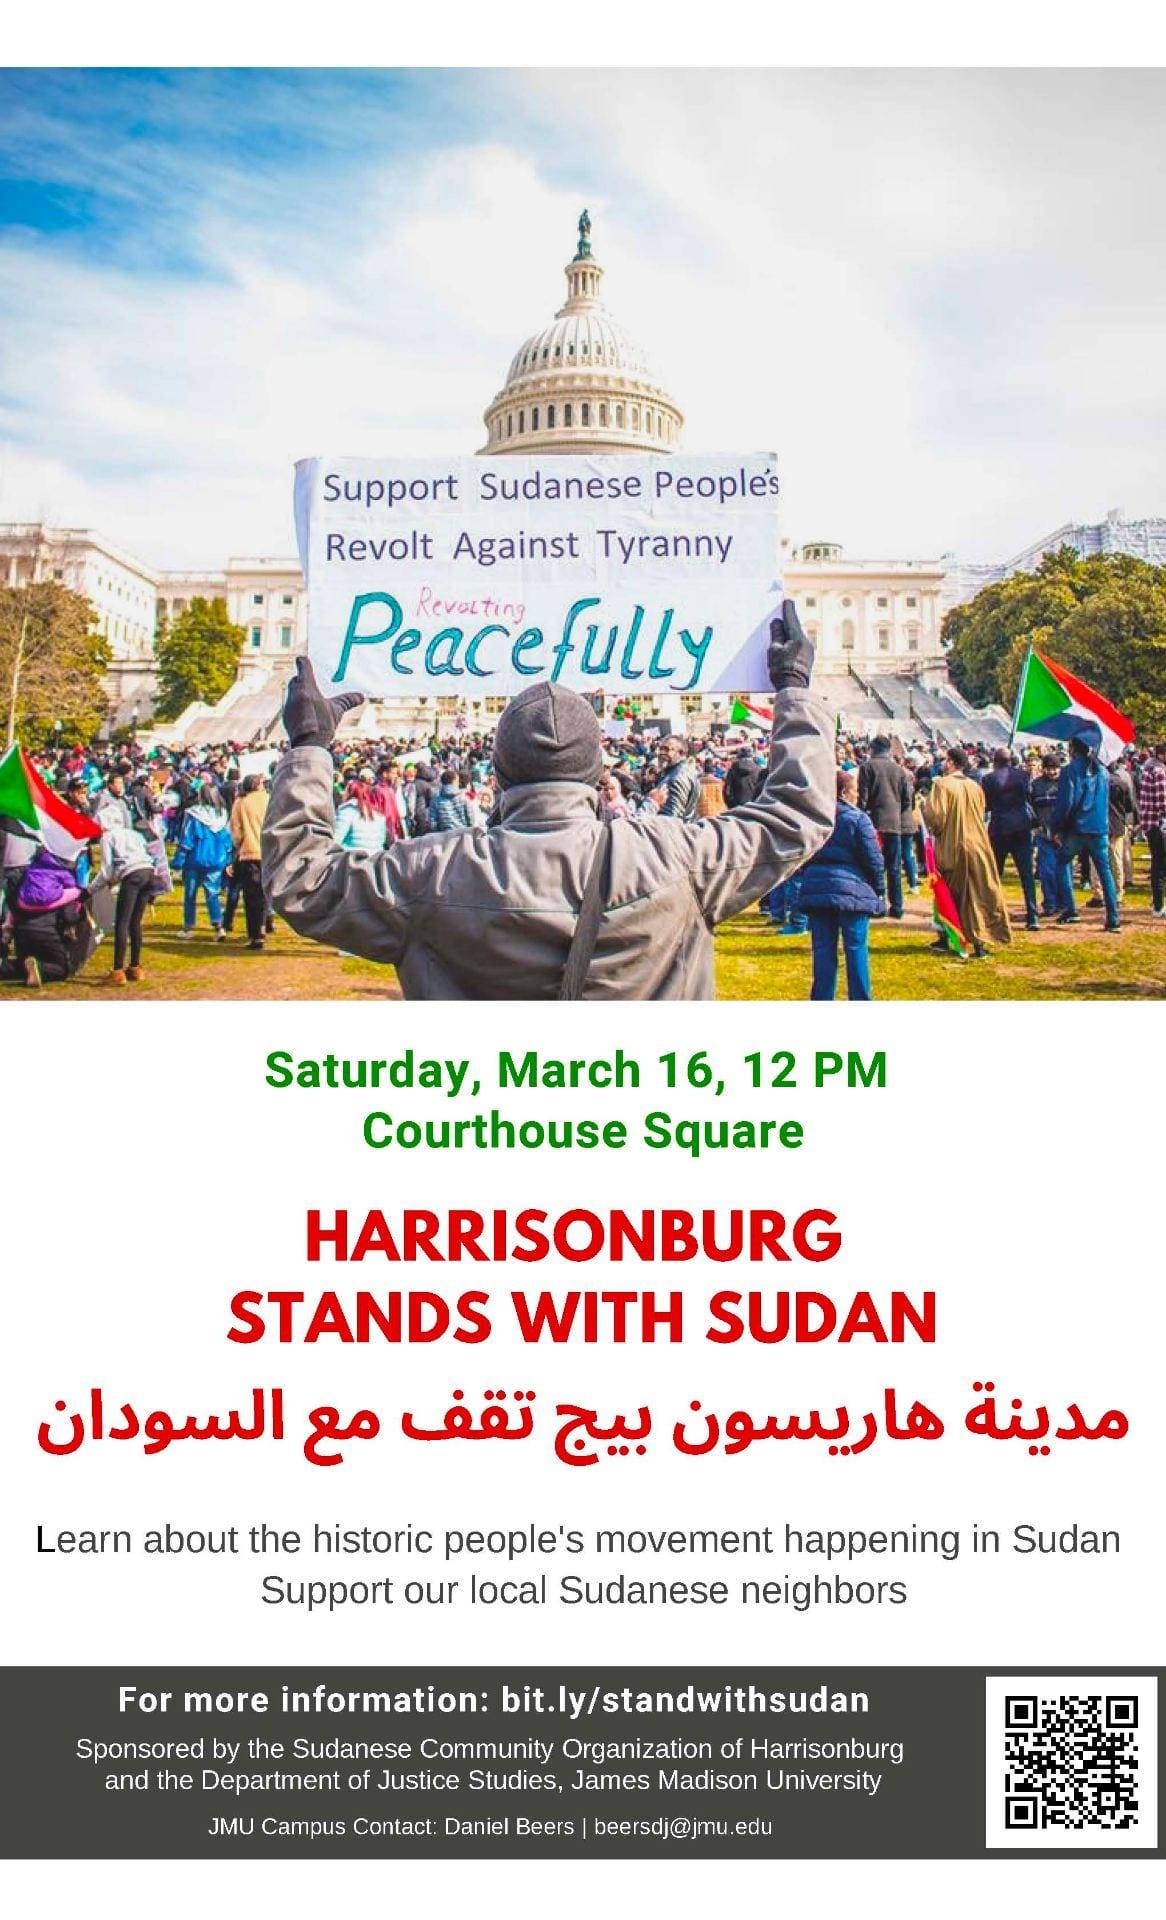 Harrisonburg Stands With Sudan JMU poster-2l6ffml